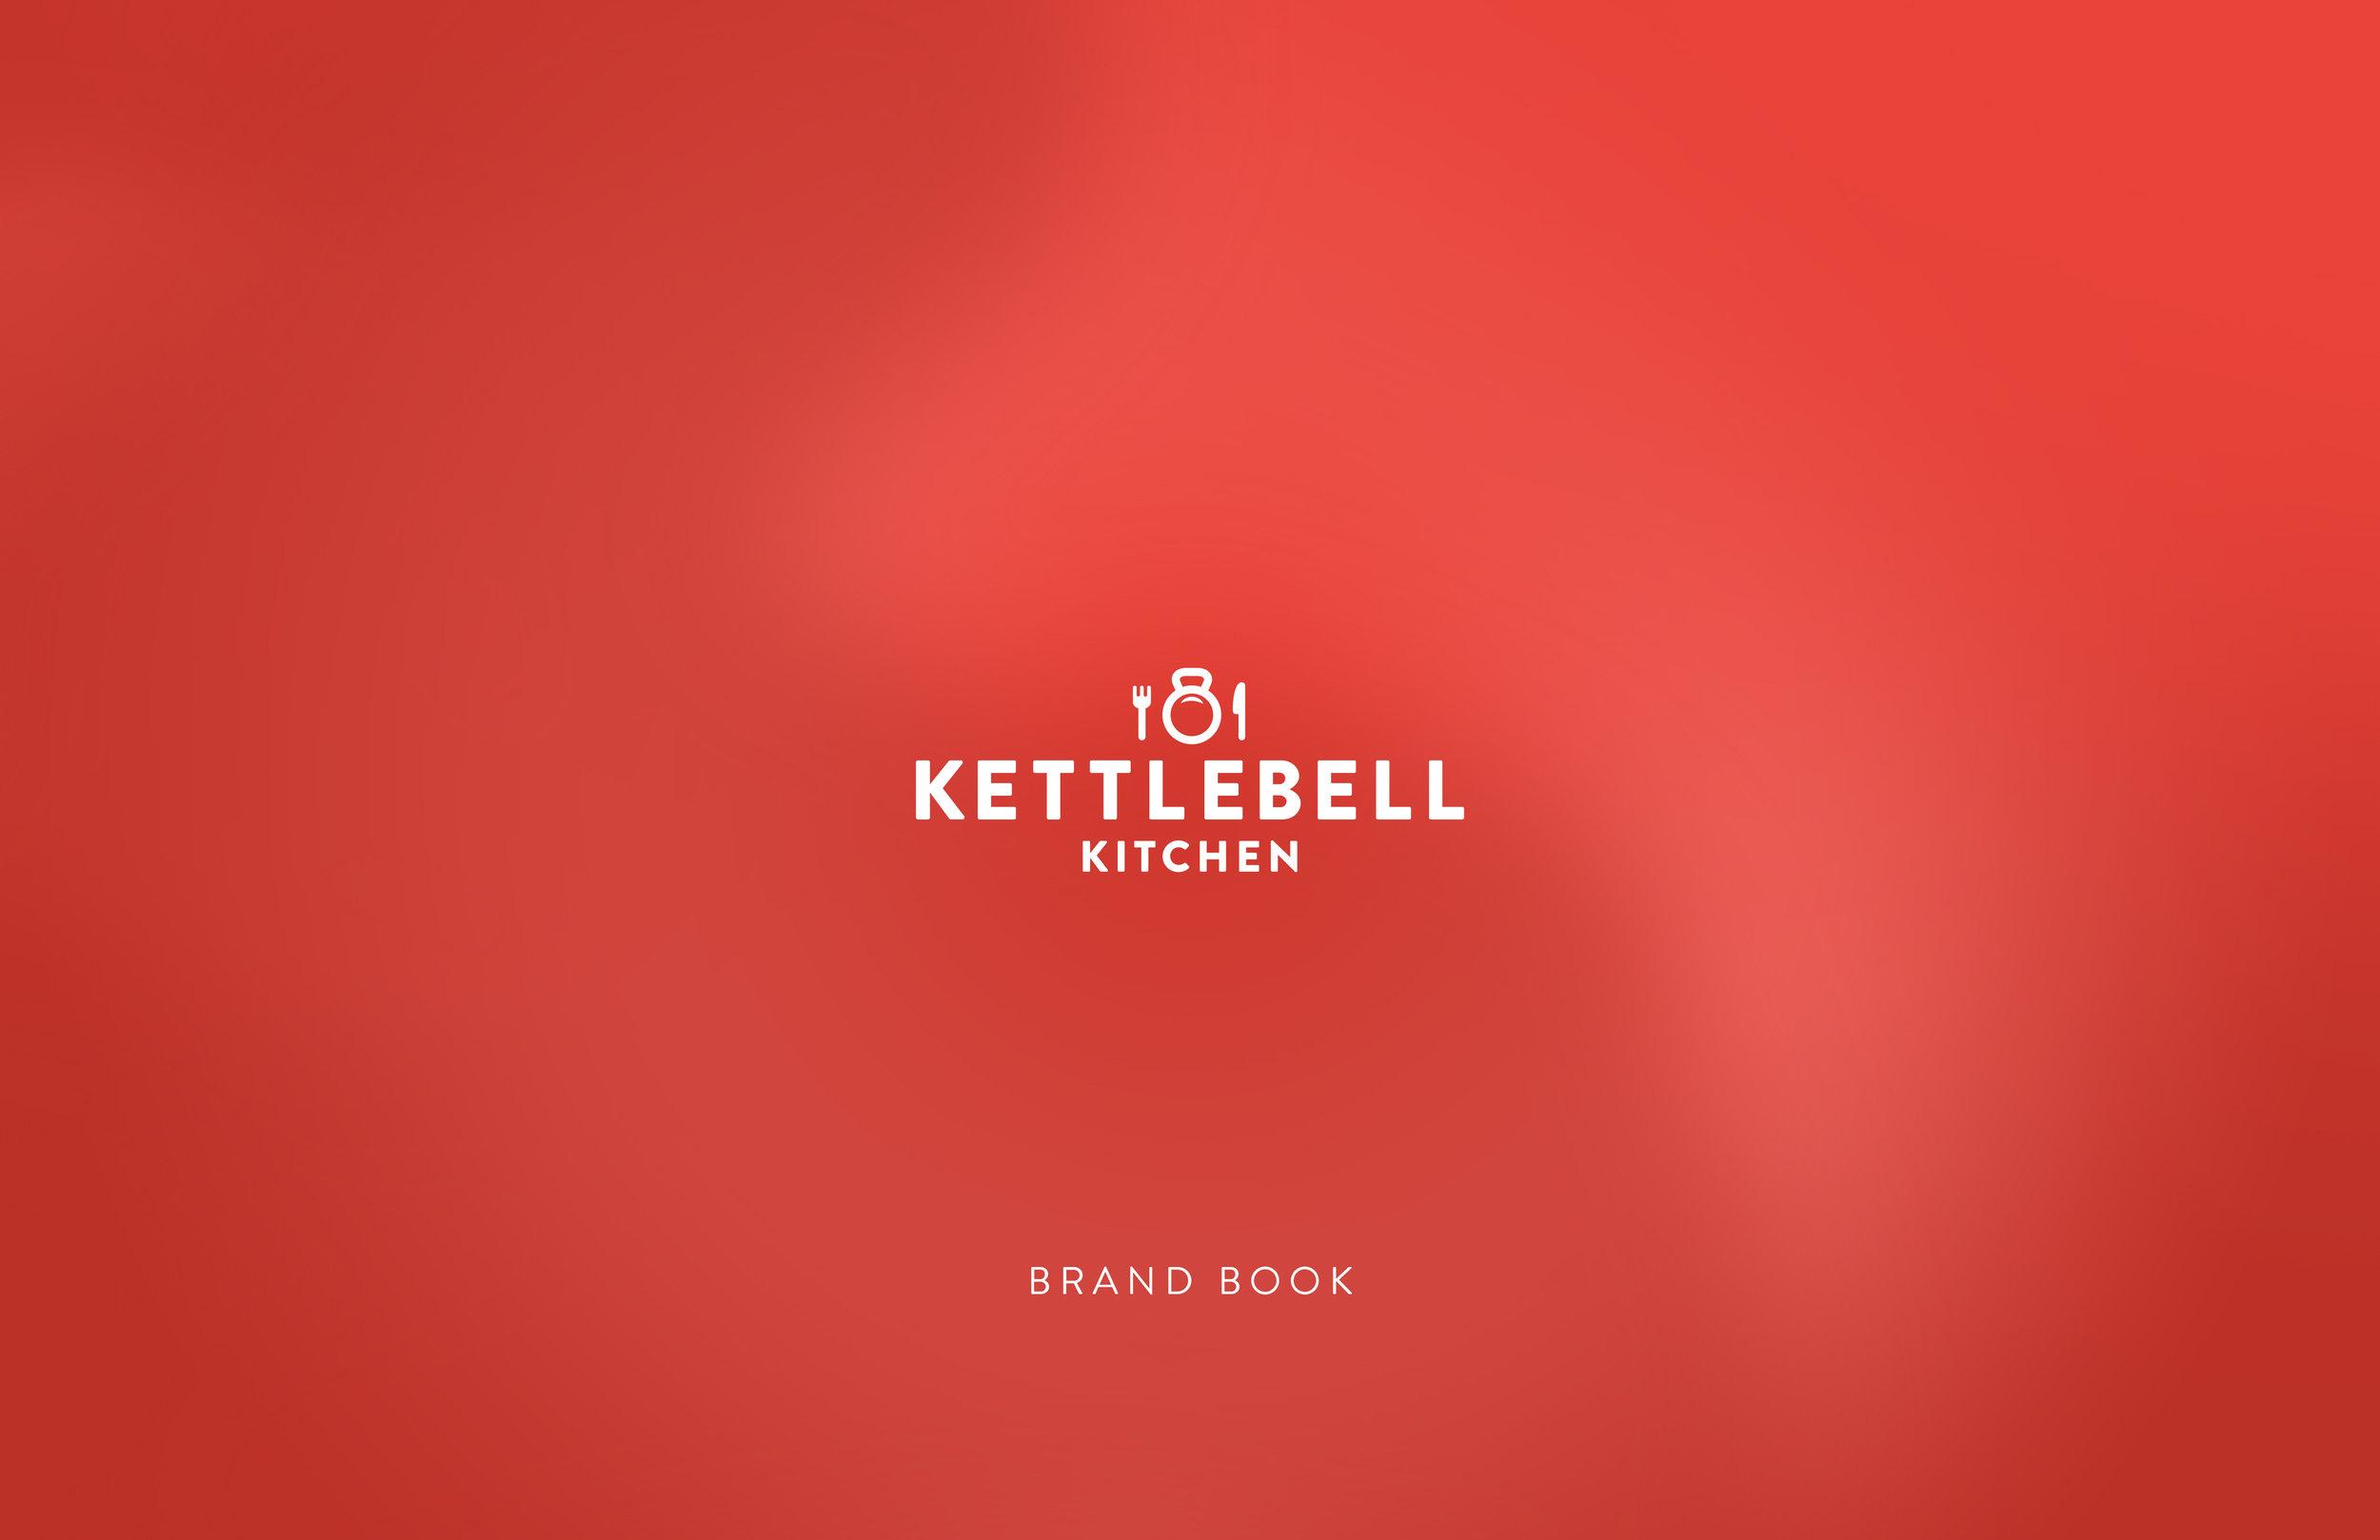 KBK_BrandBook_11.29.18 Cover.jpg